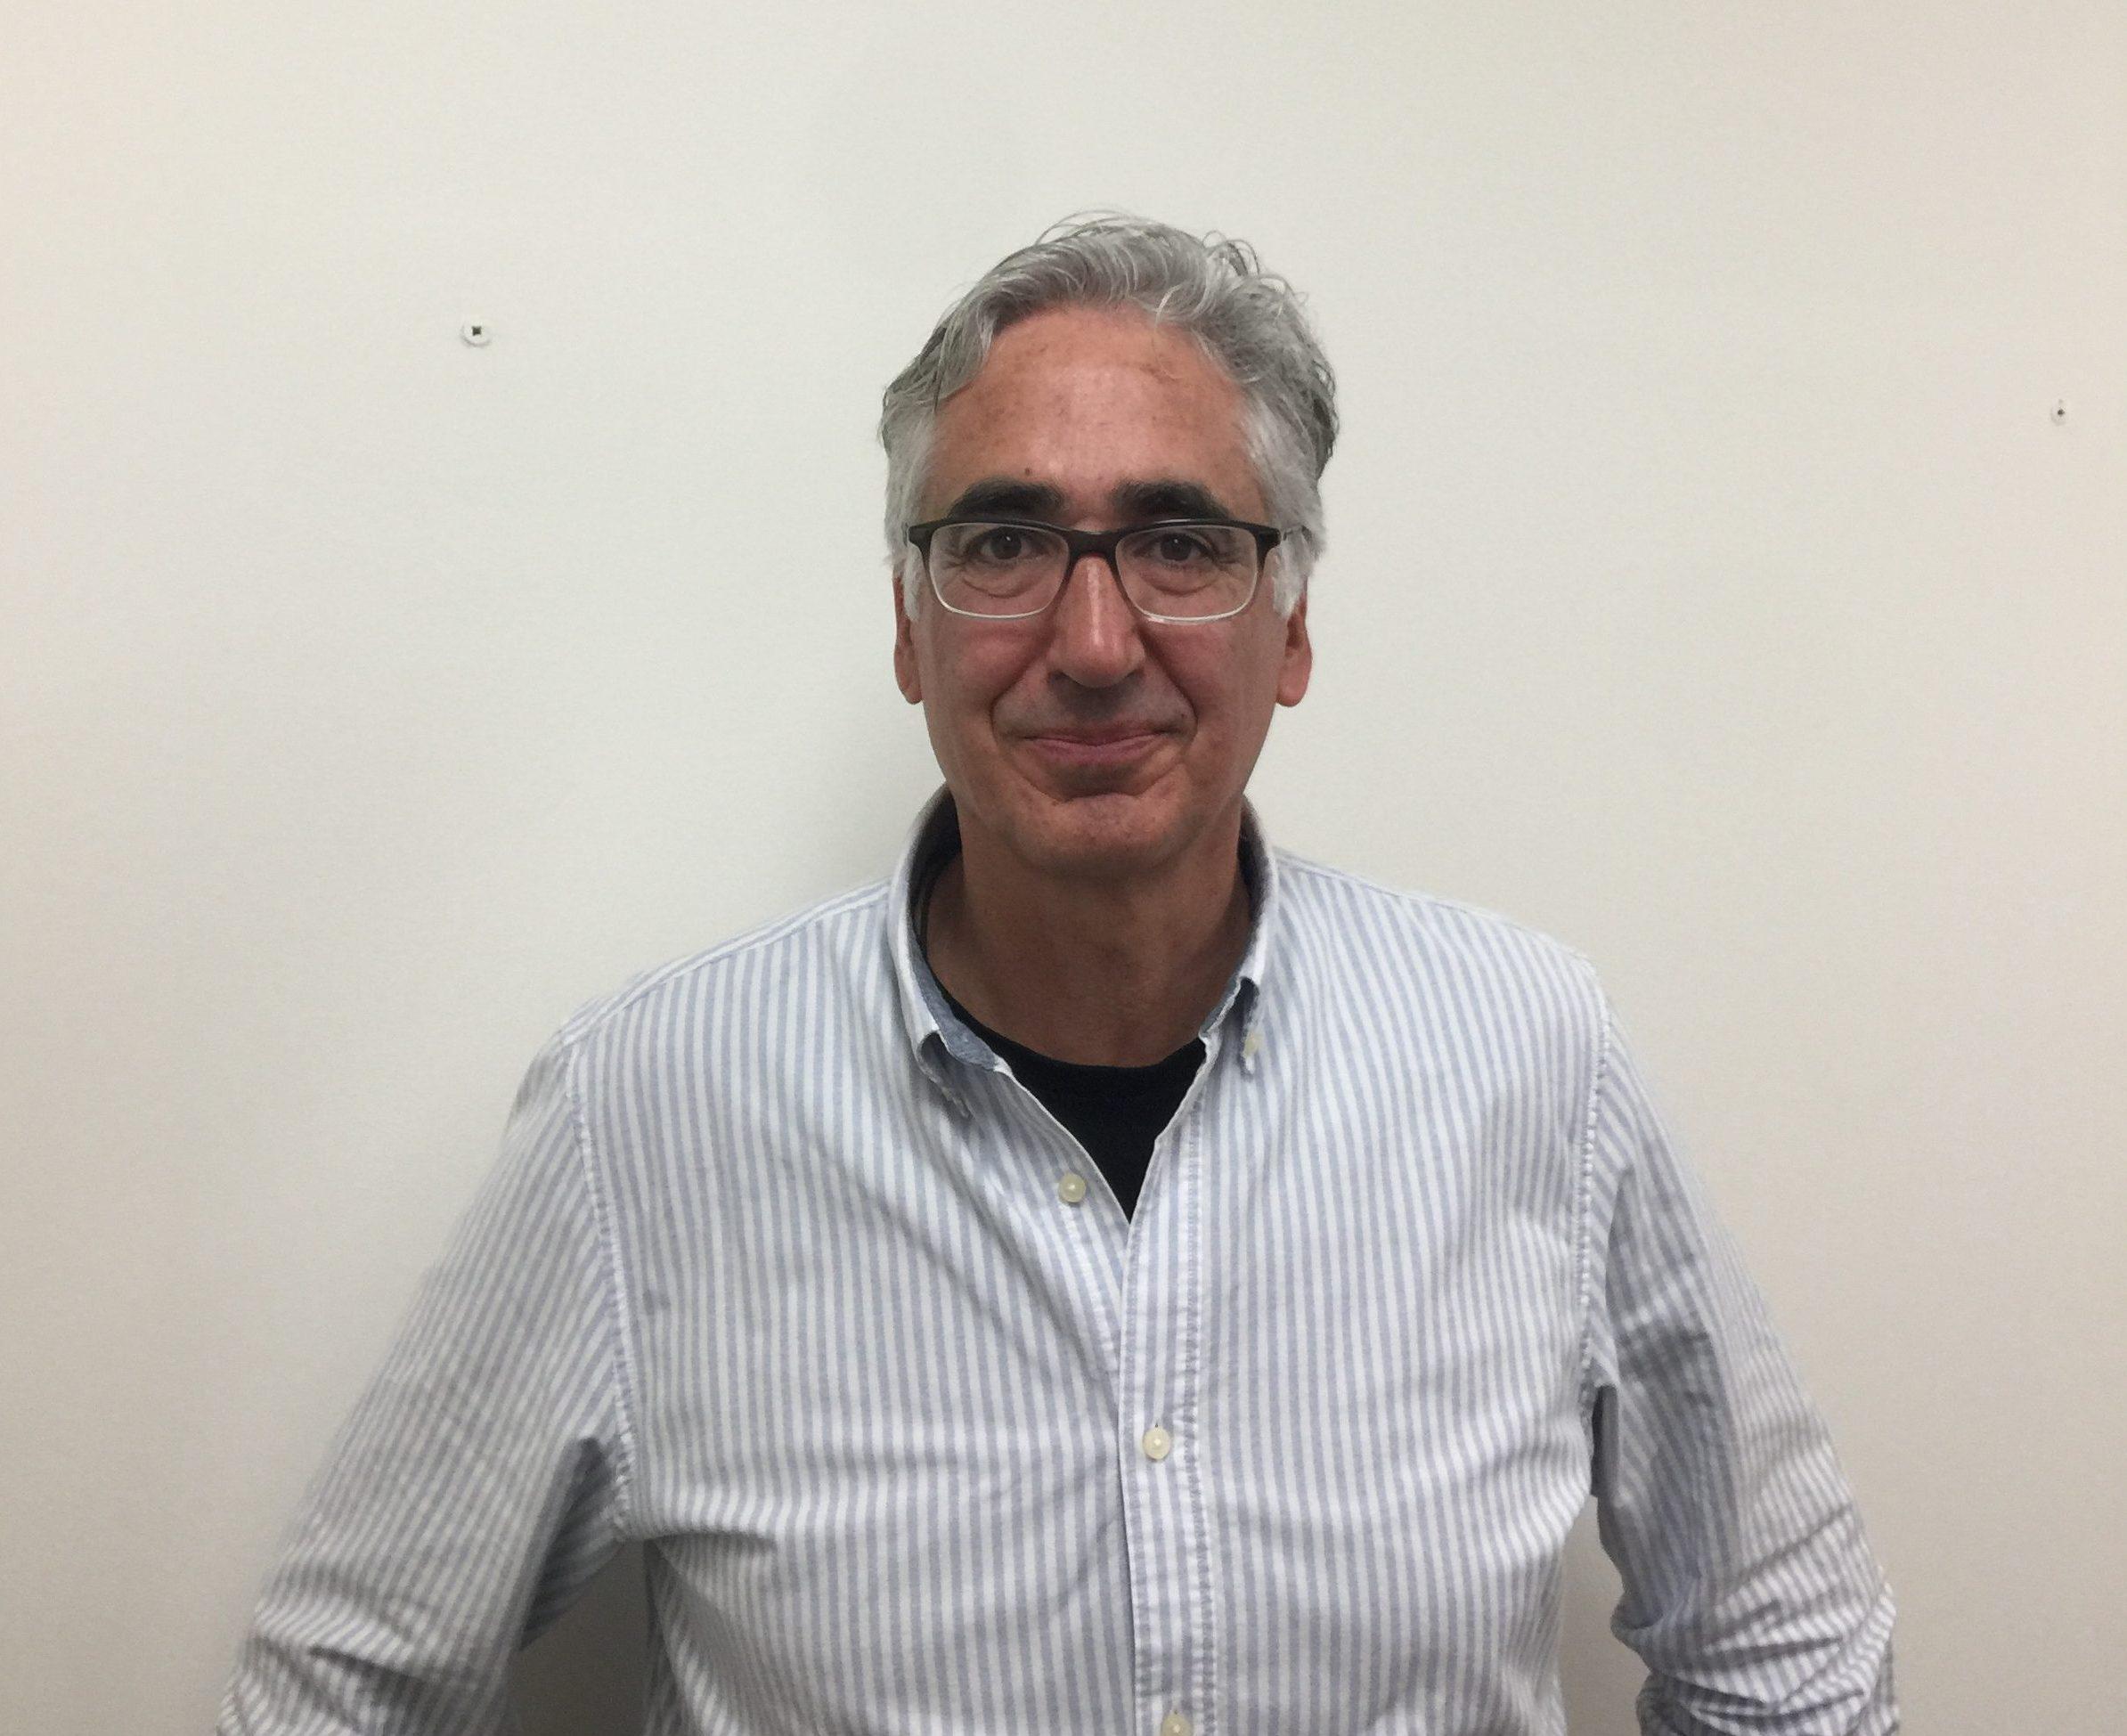 Picture of Joseph Ohayon, Principal – Western Australia